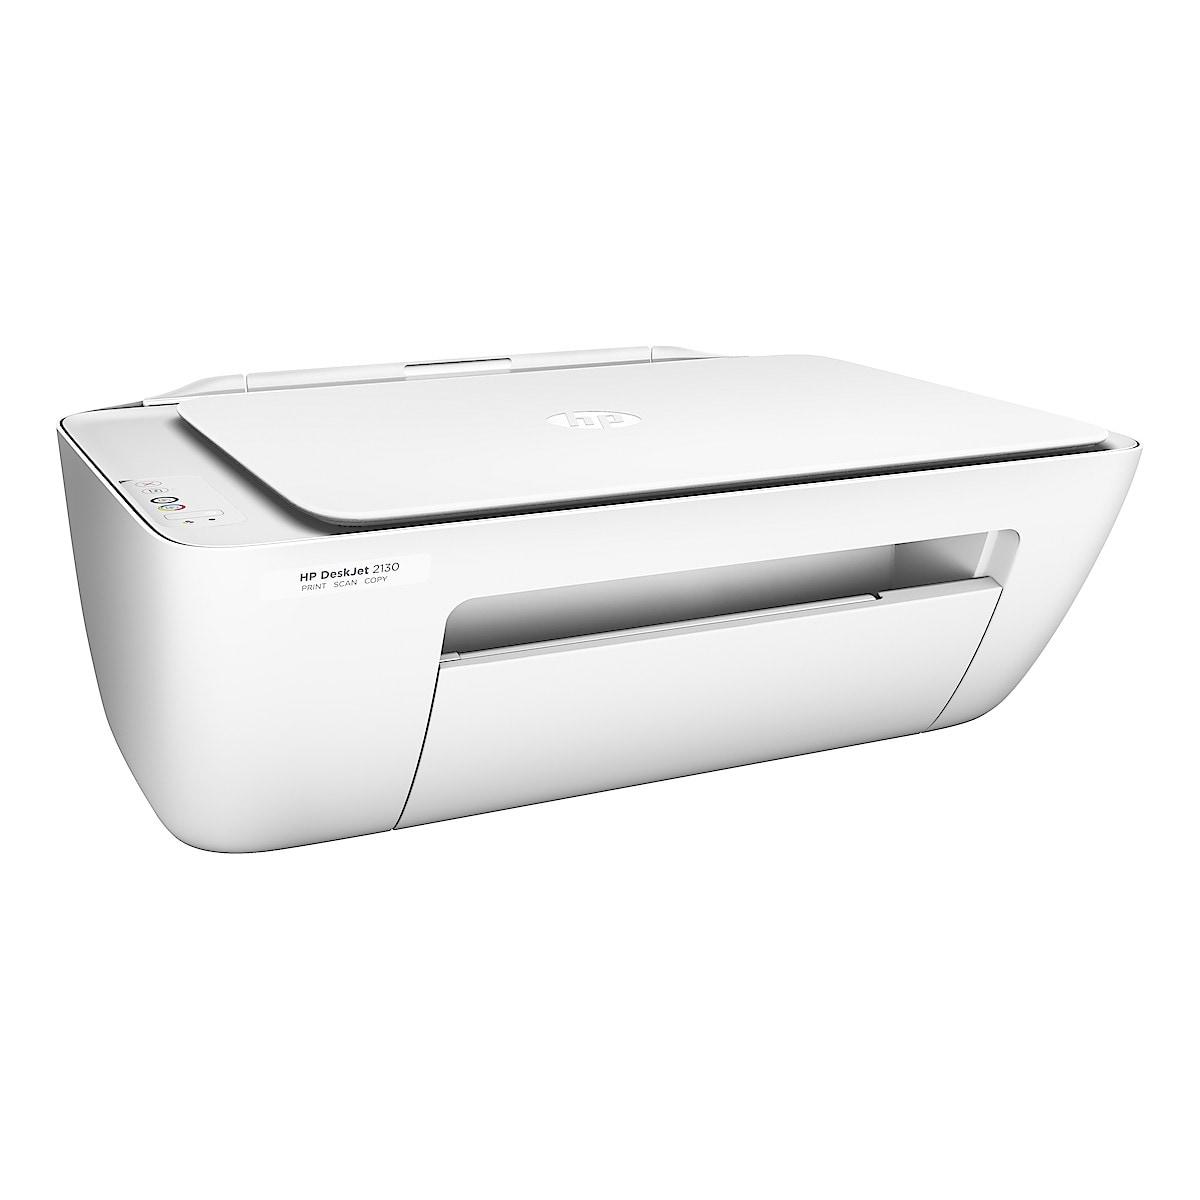 Drucker HP DeskJet 2130 AiO